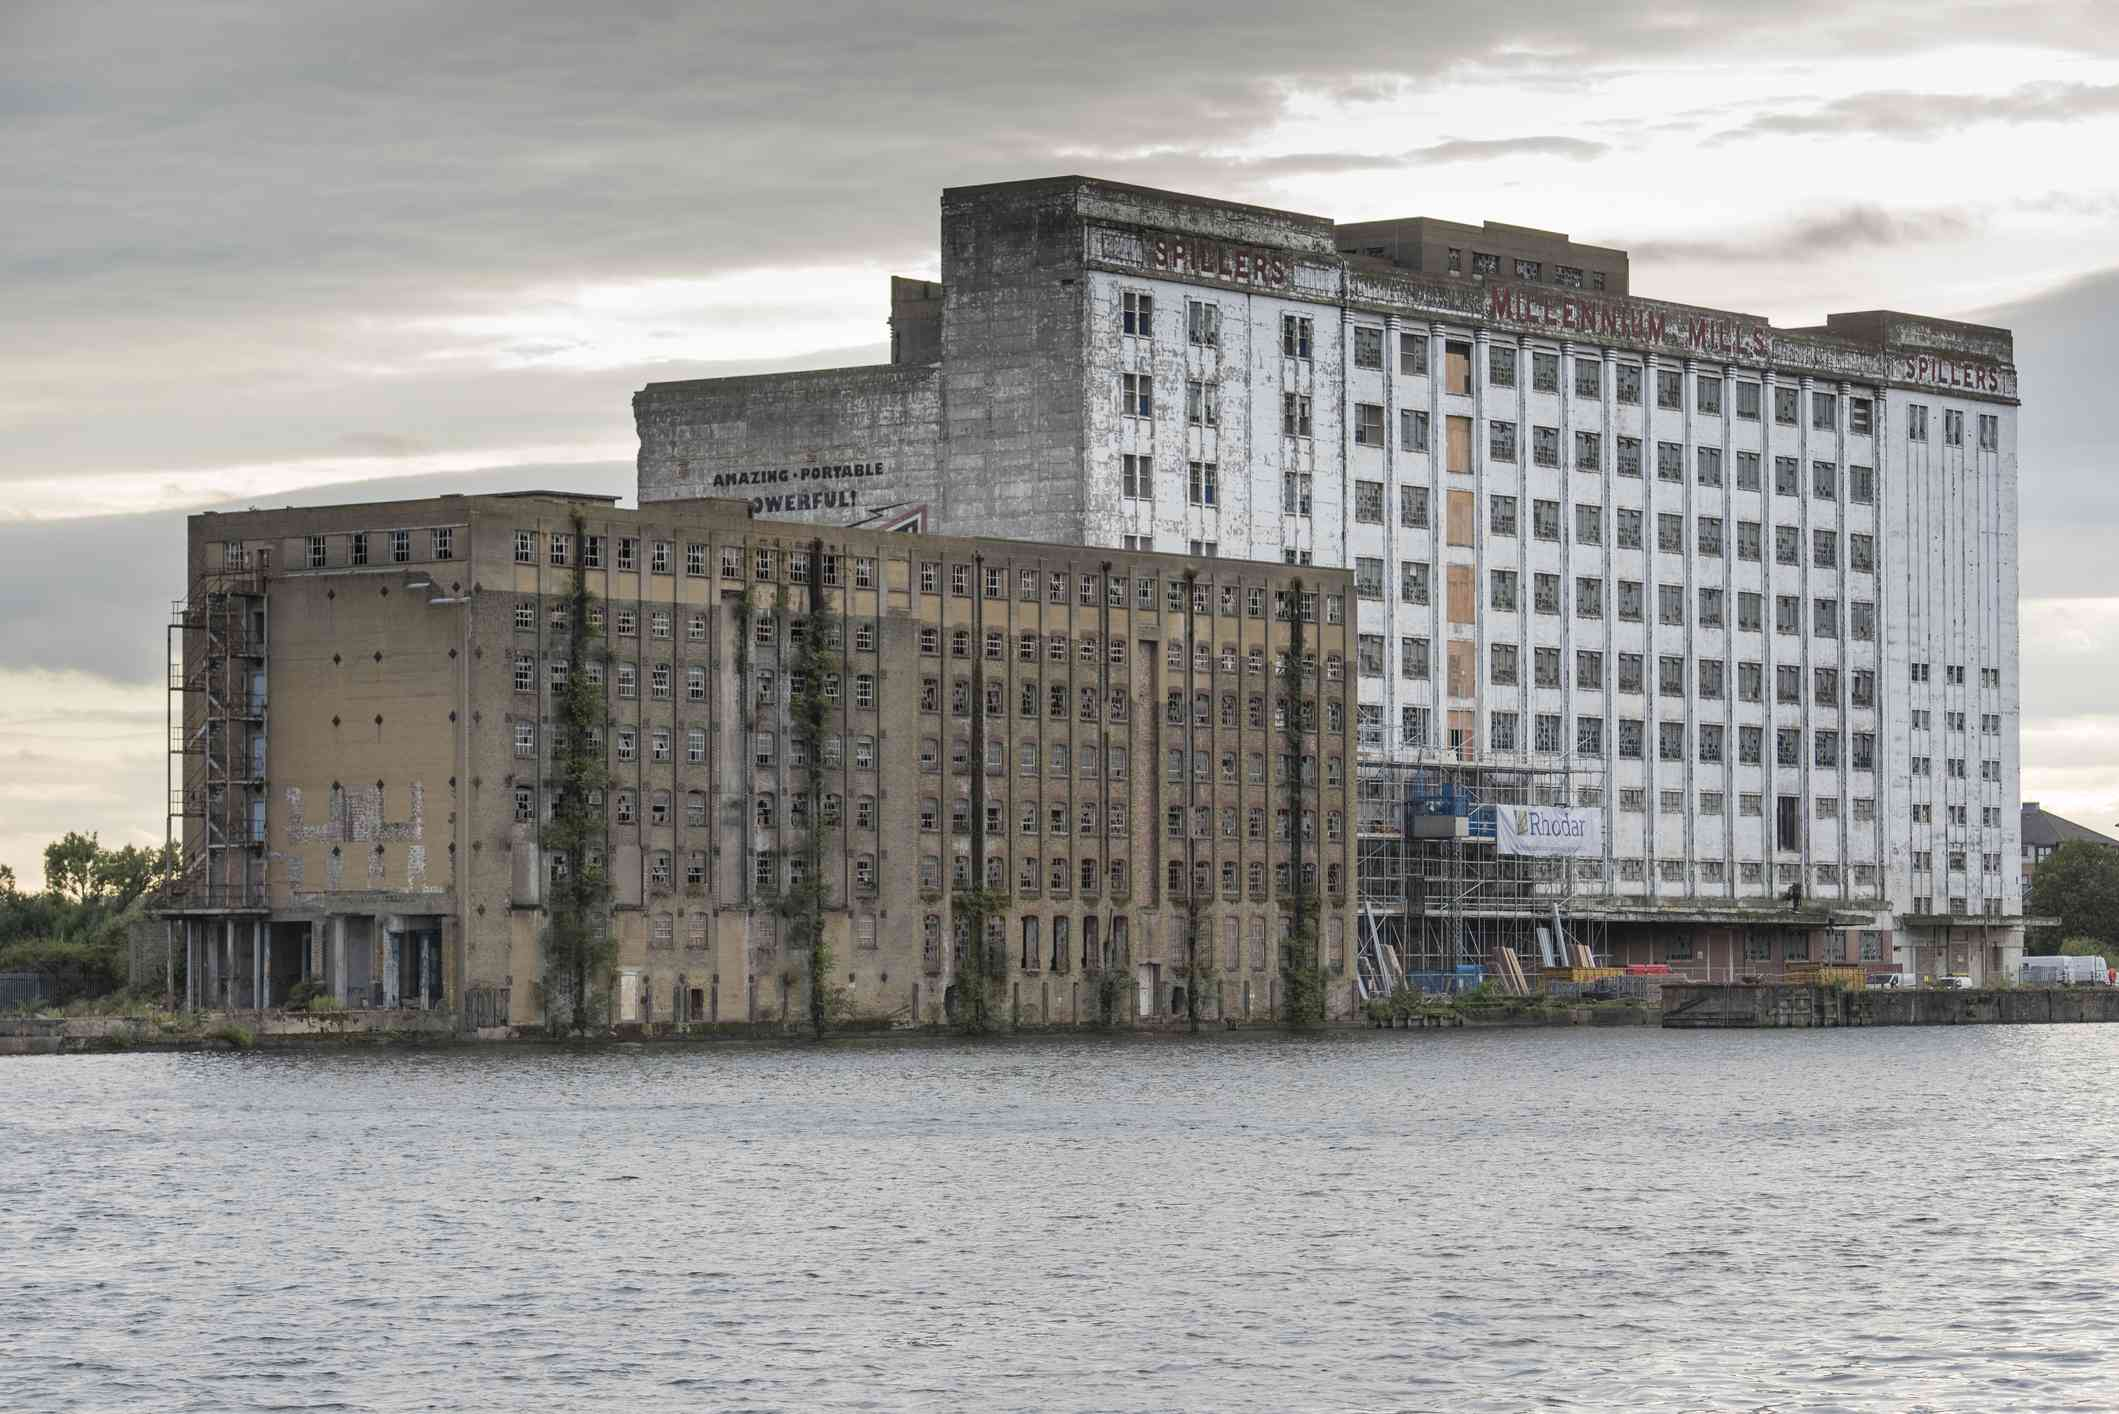 Derelict warehouse in London